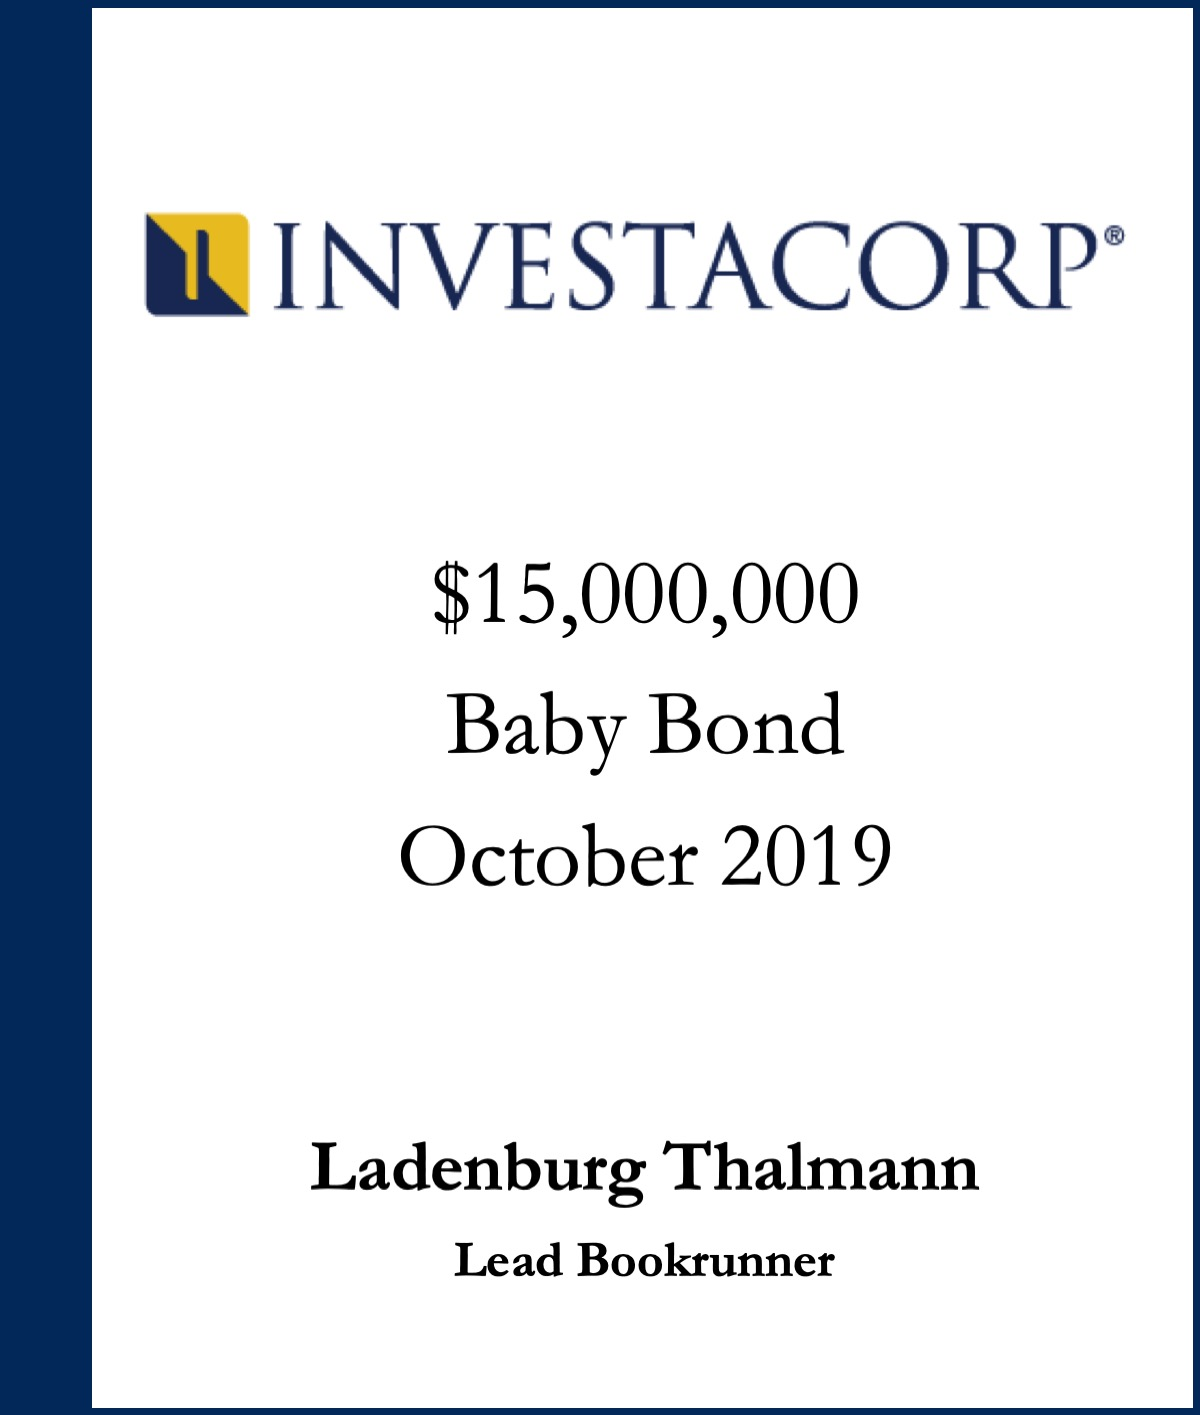 Investacorp